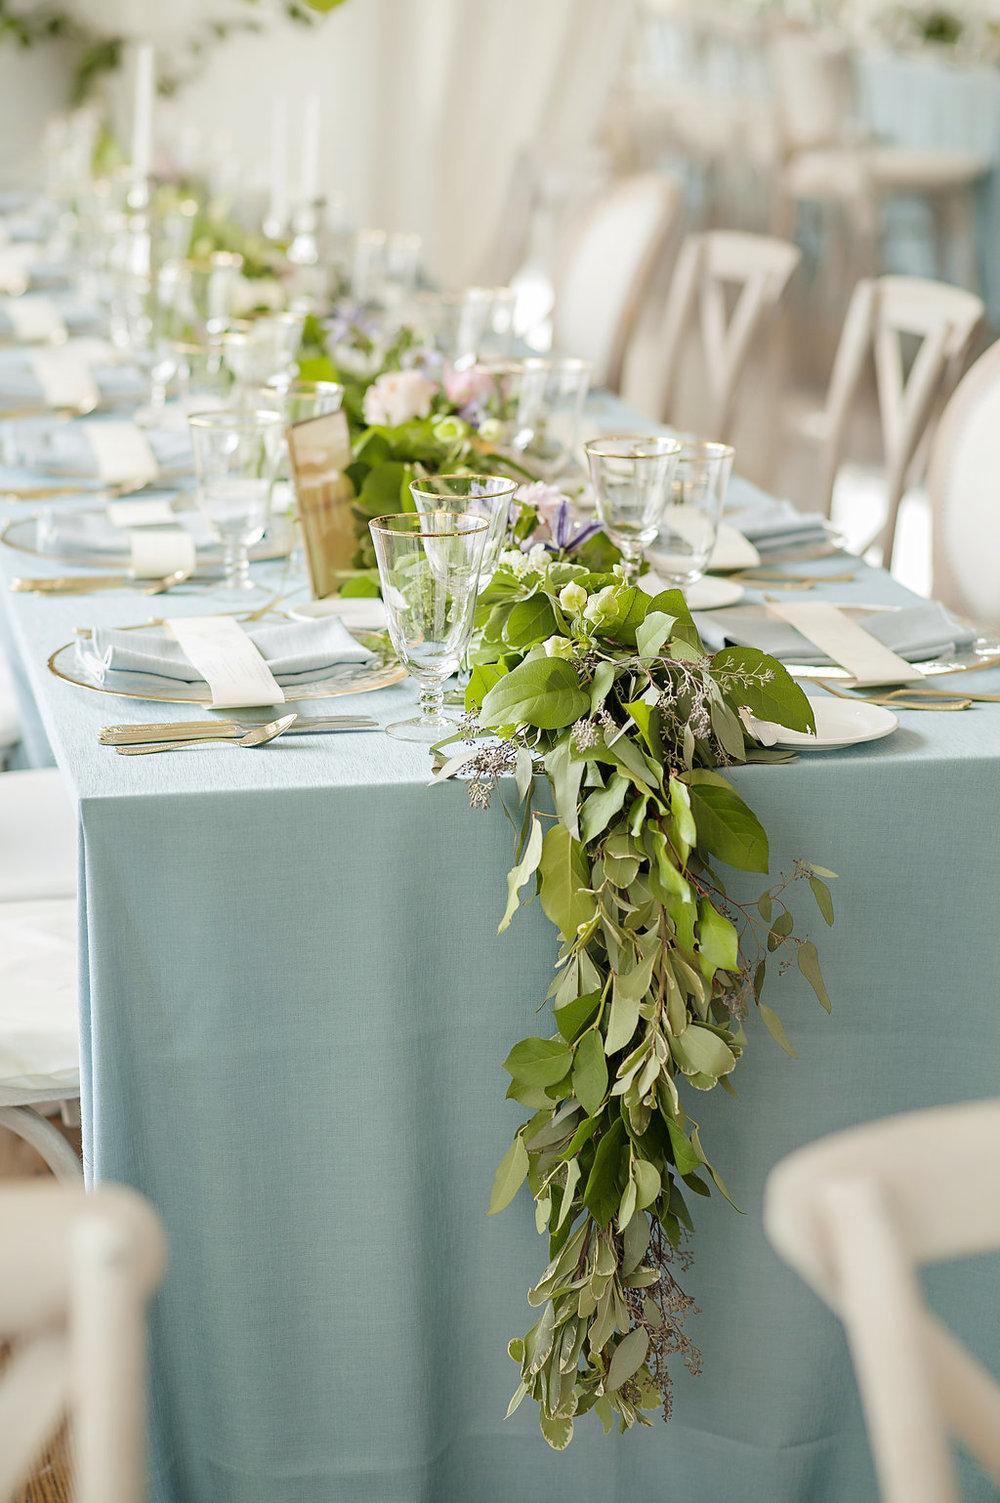 Floral table runner for Cincinnati wedding